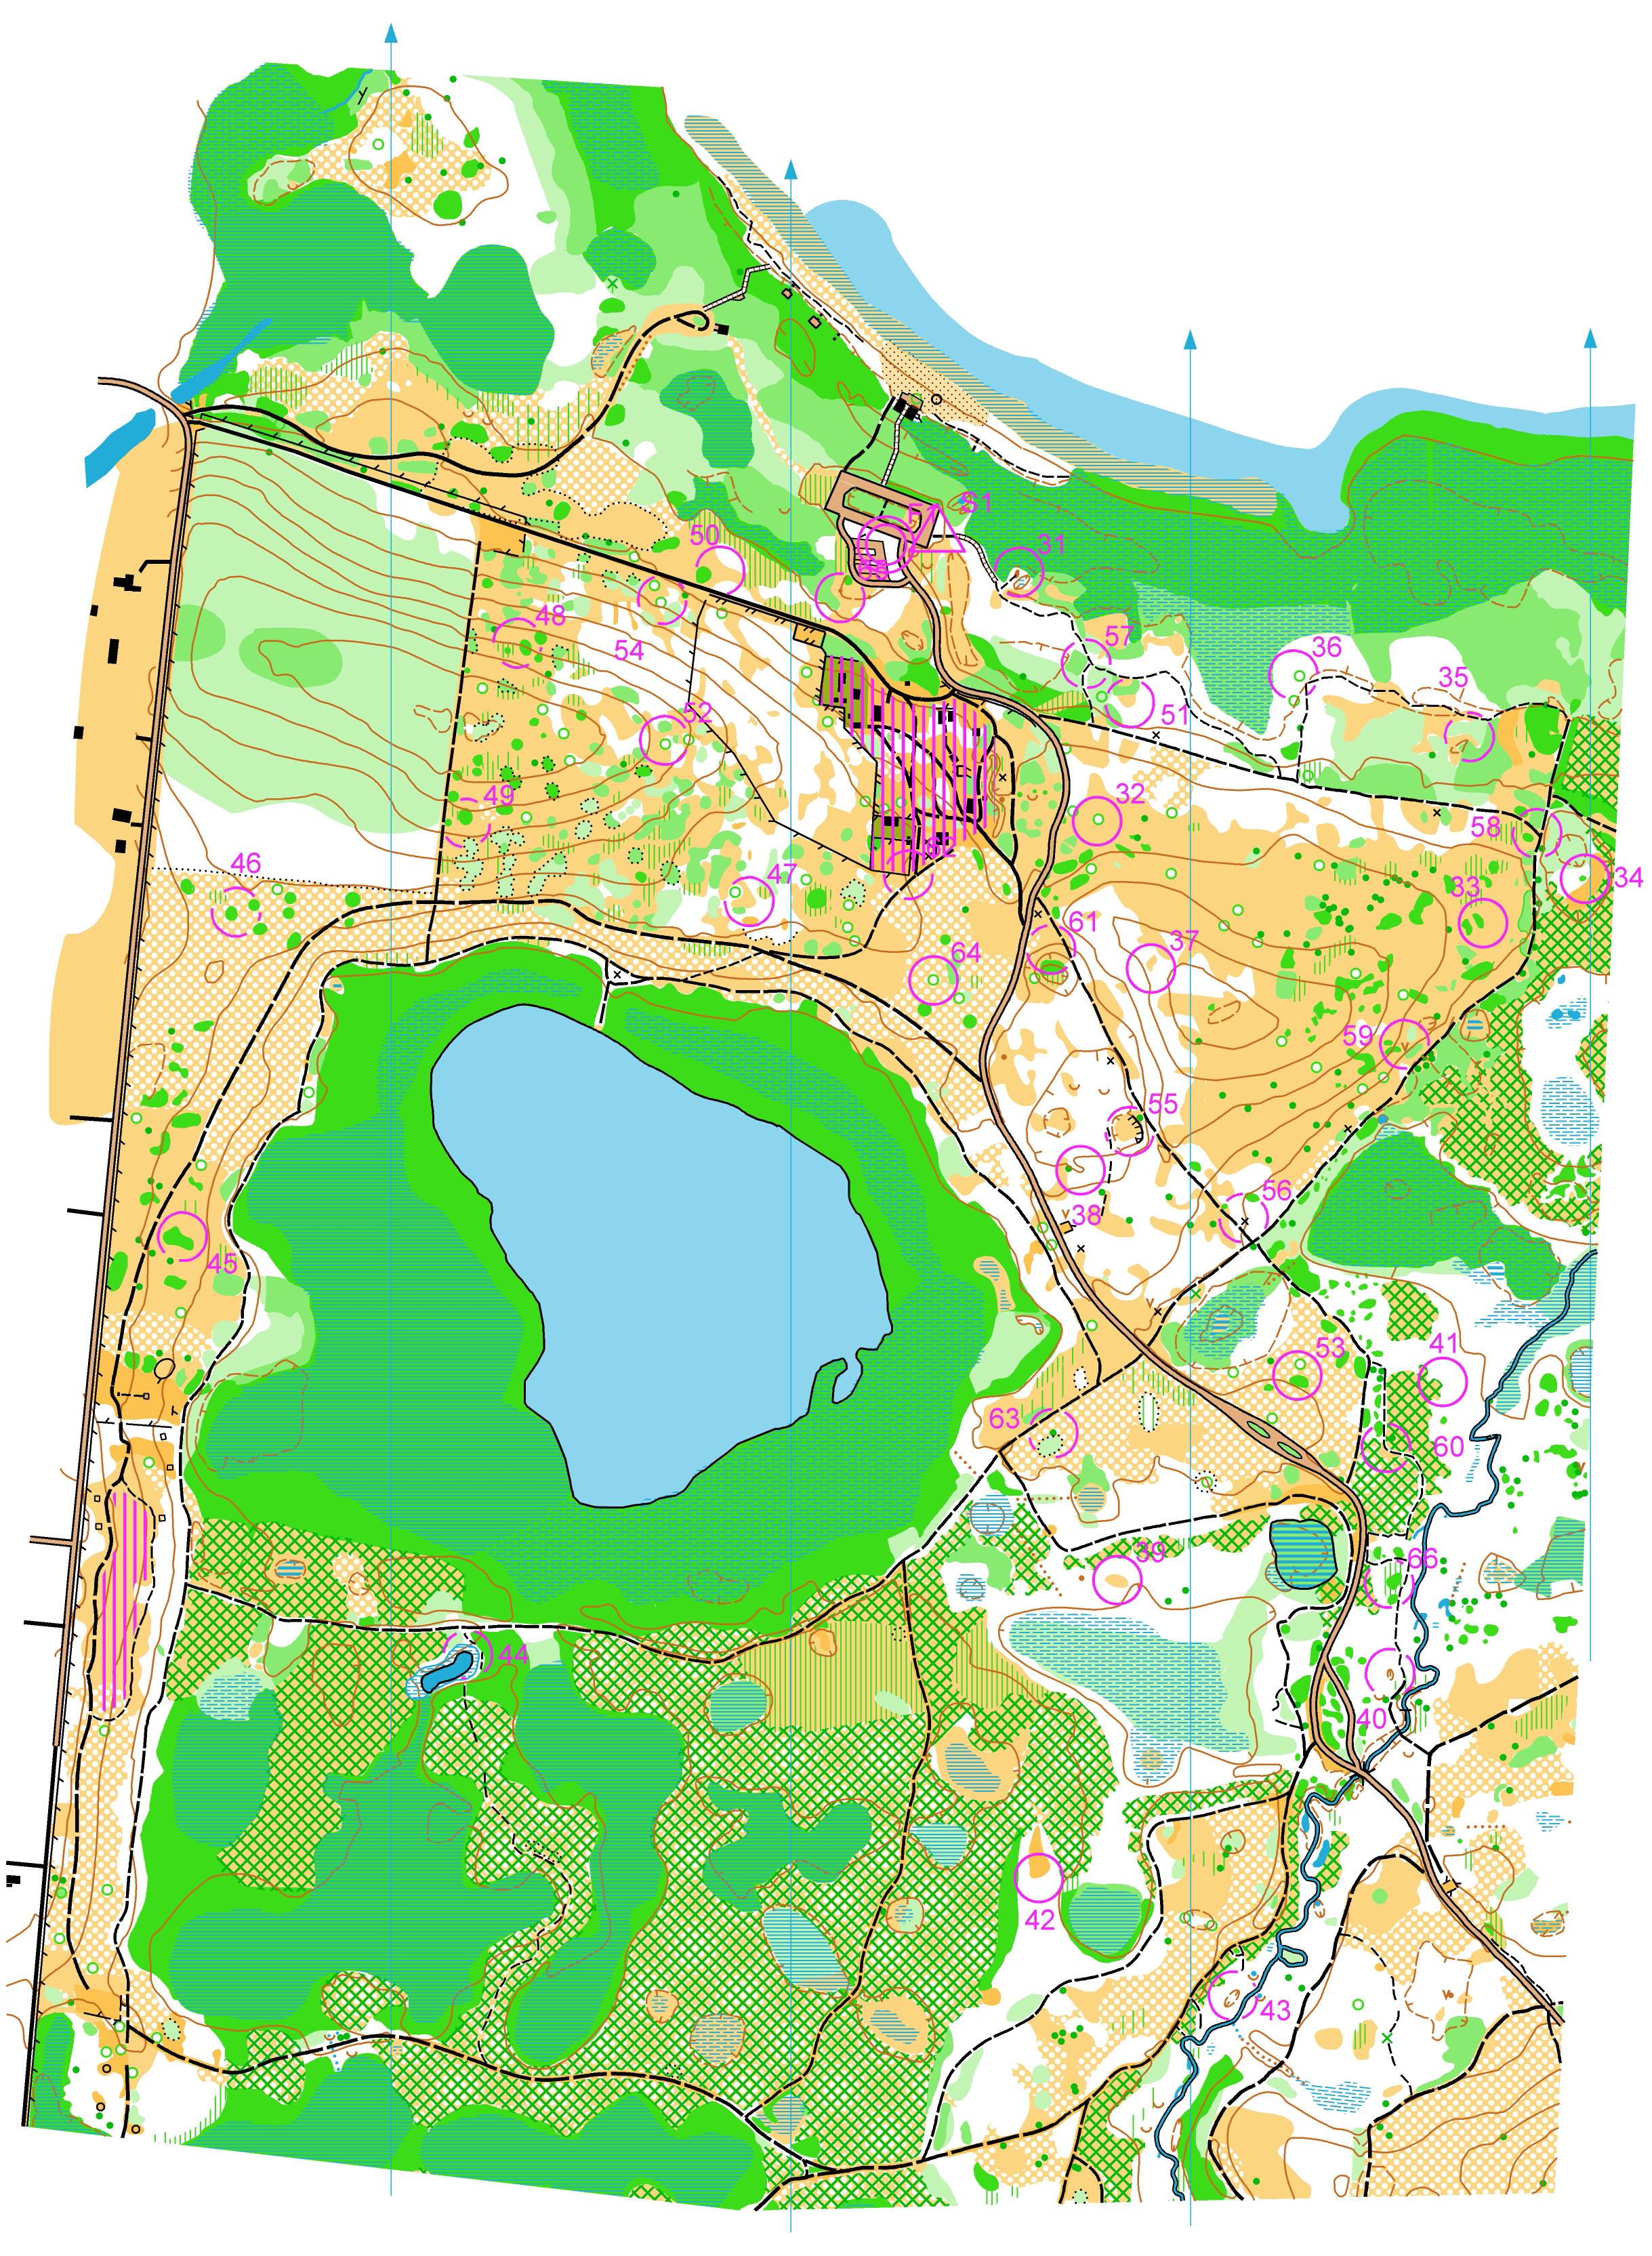 Florida Orienteering Results - Florida map state parks